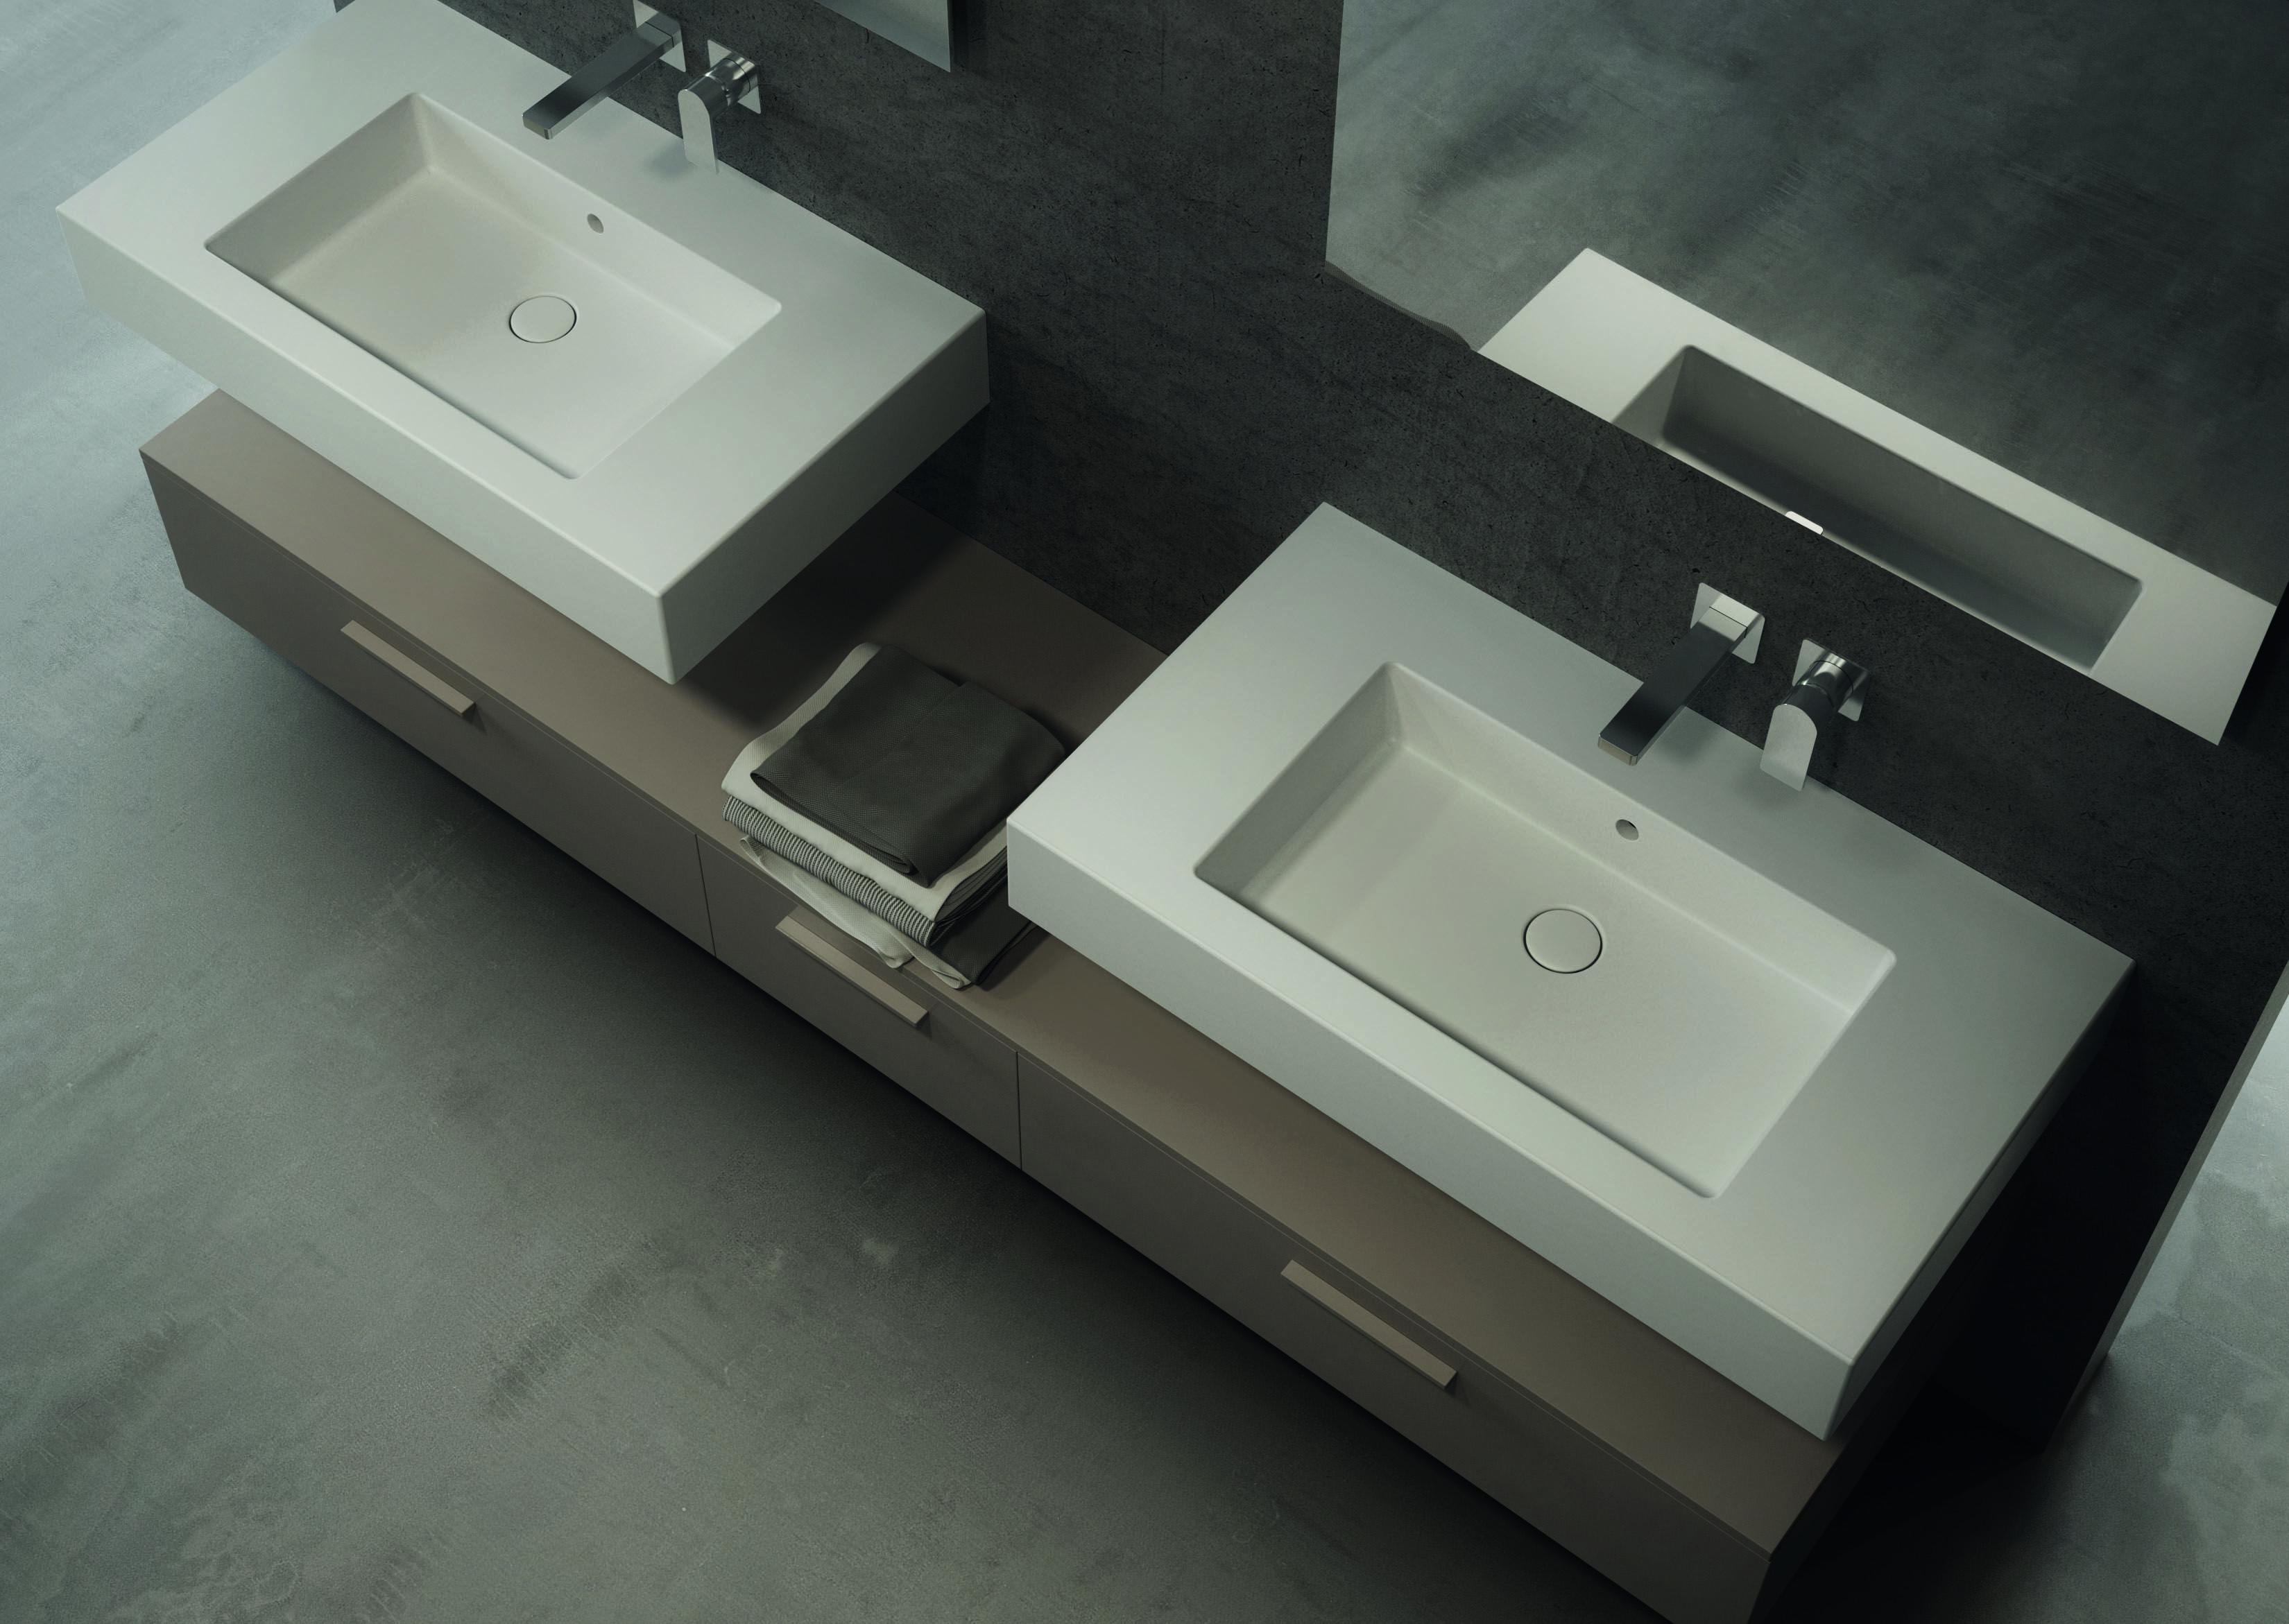 luca sanitair globo incantho meubellijn product in beeld